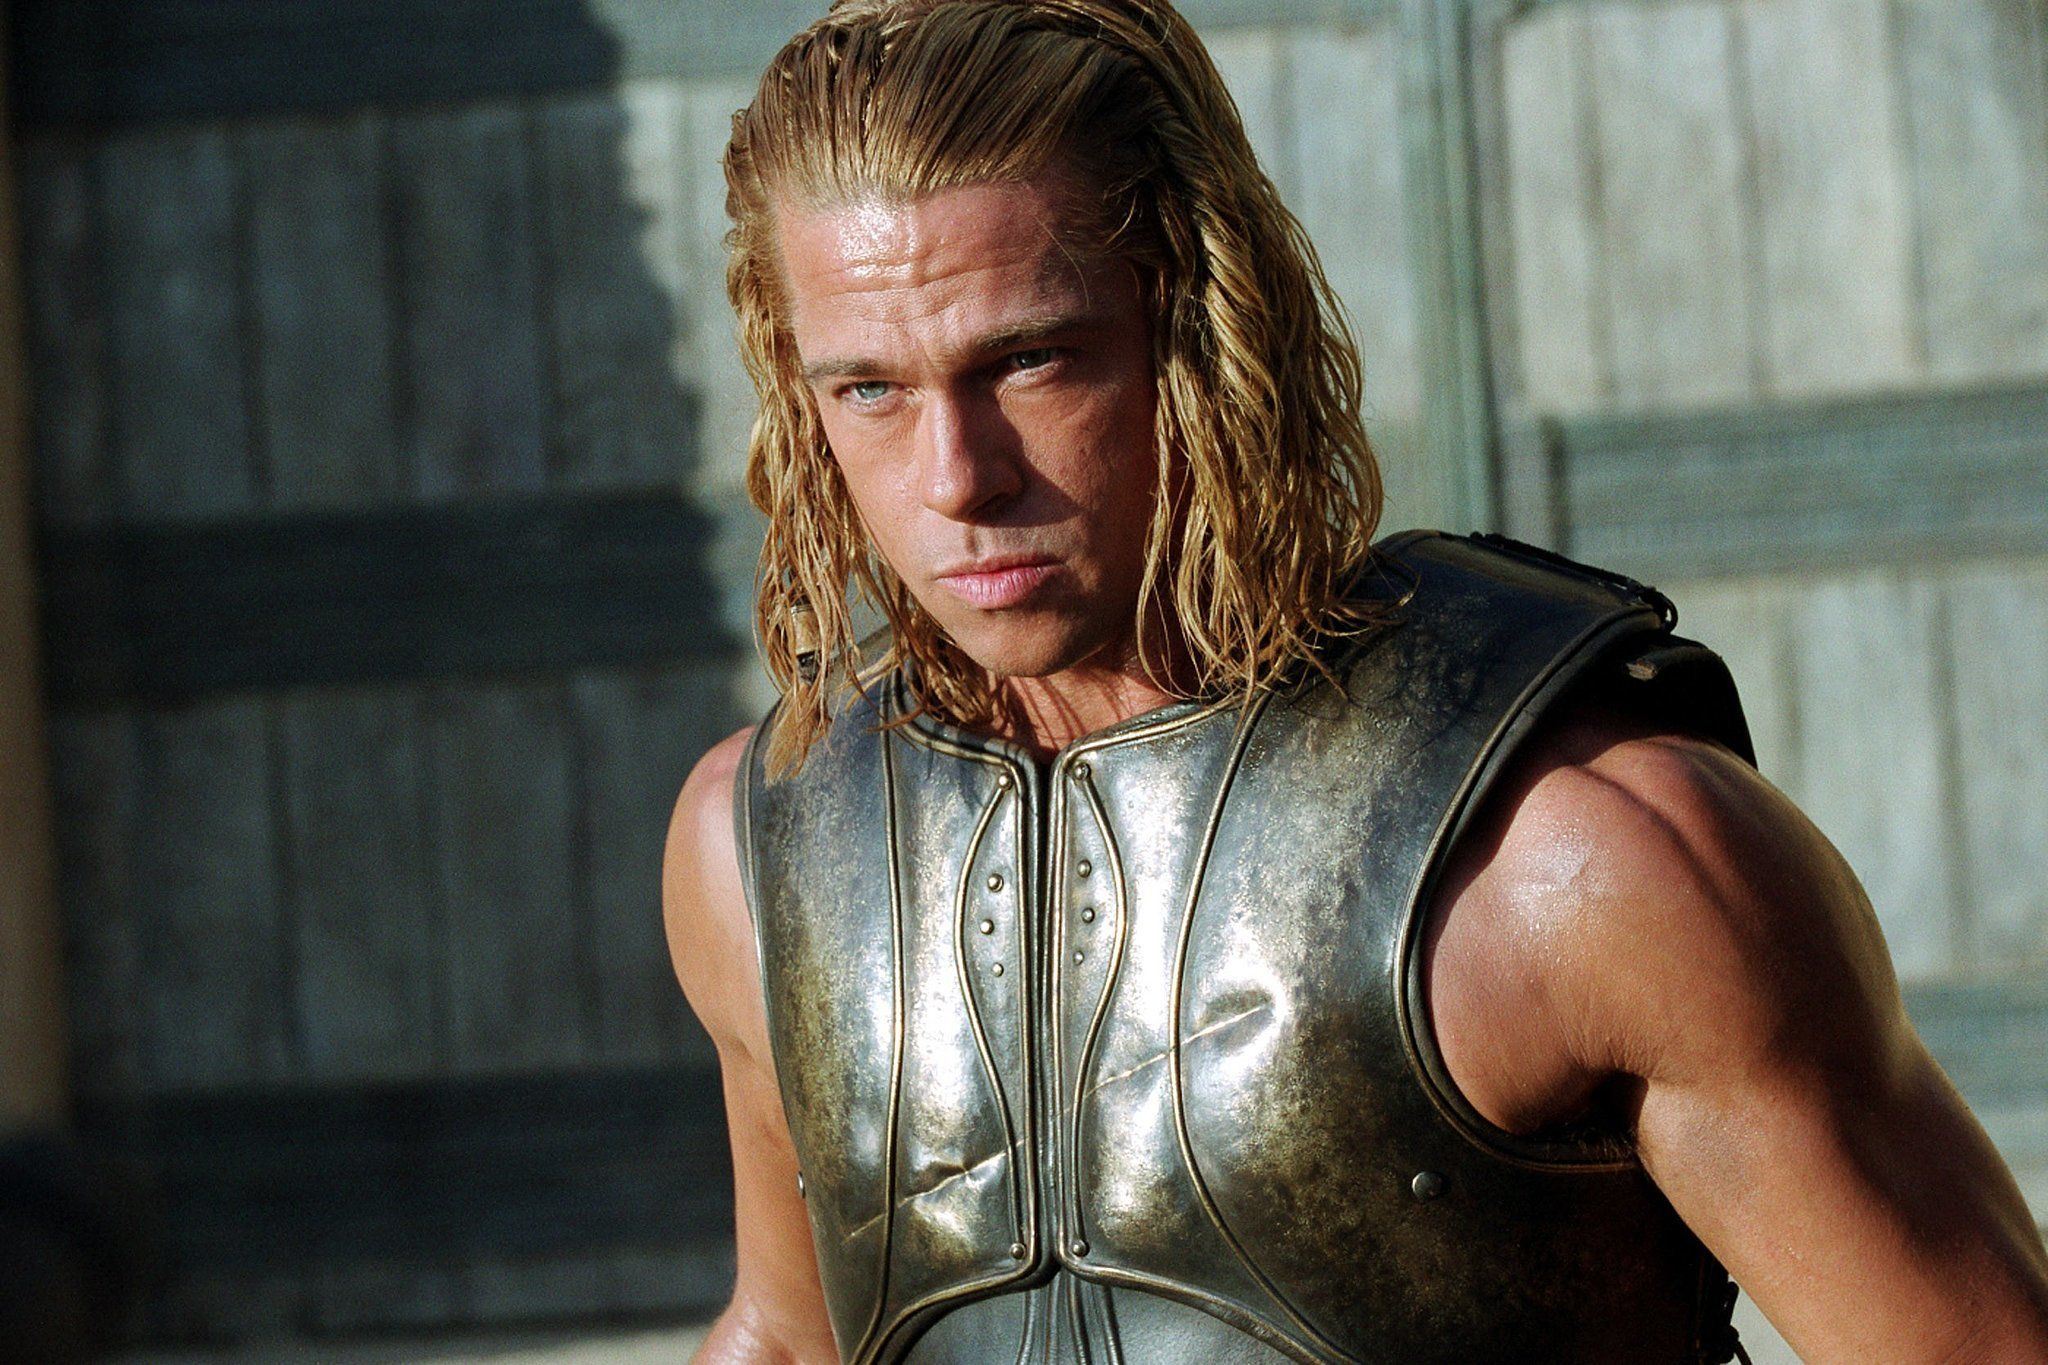 Brad Pitt looking serious wearing armor in Troy